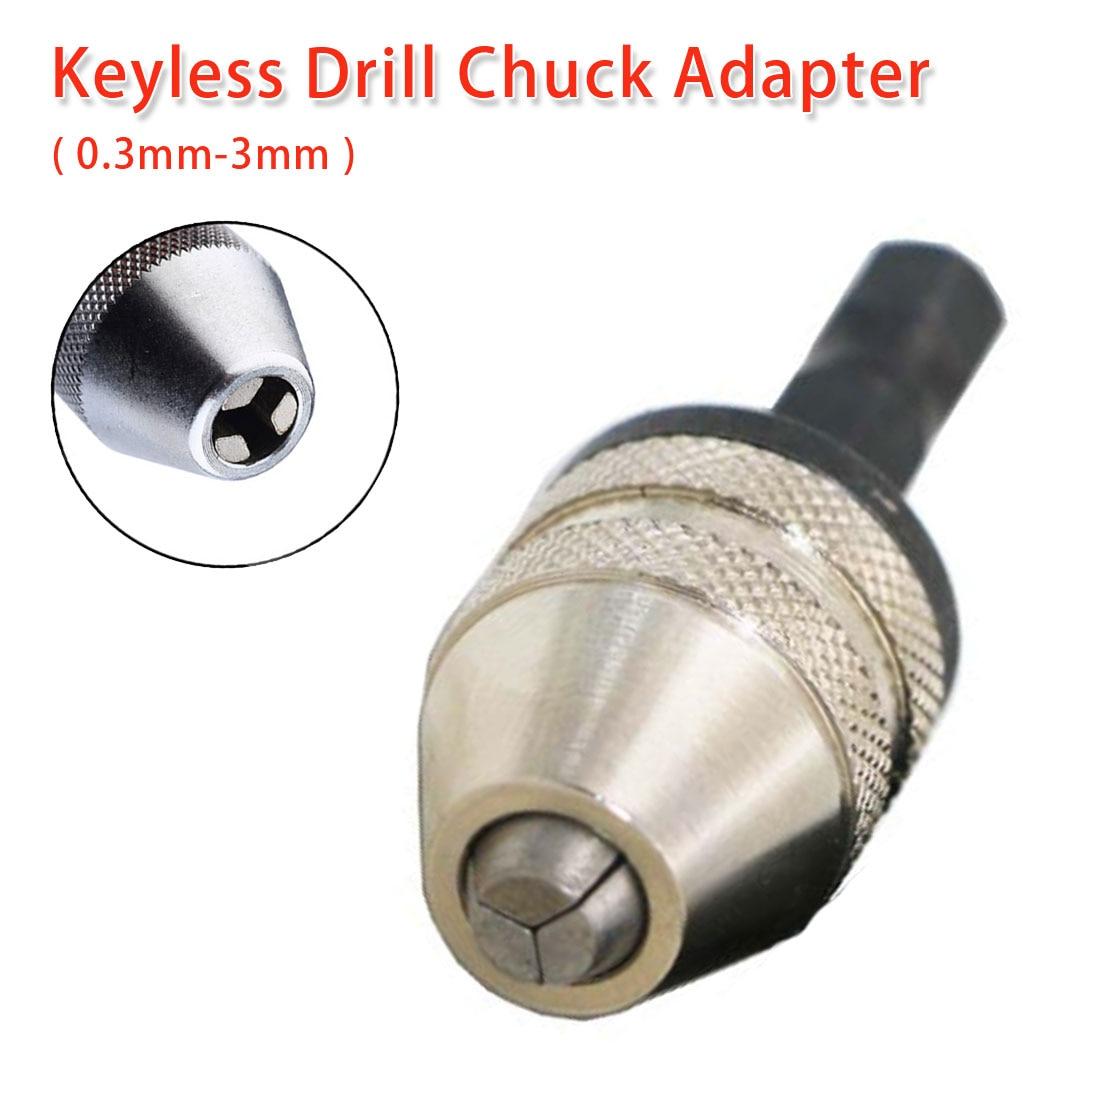 Hex Shank Drill Bit Tool Shaft Chuck 0.3-3mm Keyless Drill Chuck Adapter Screwdriver Impact Driver Adaptor For Electric Grinder